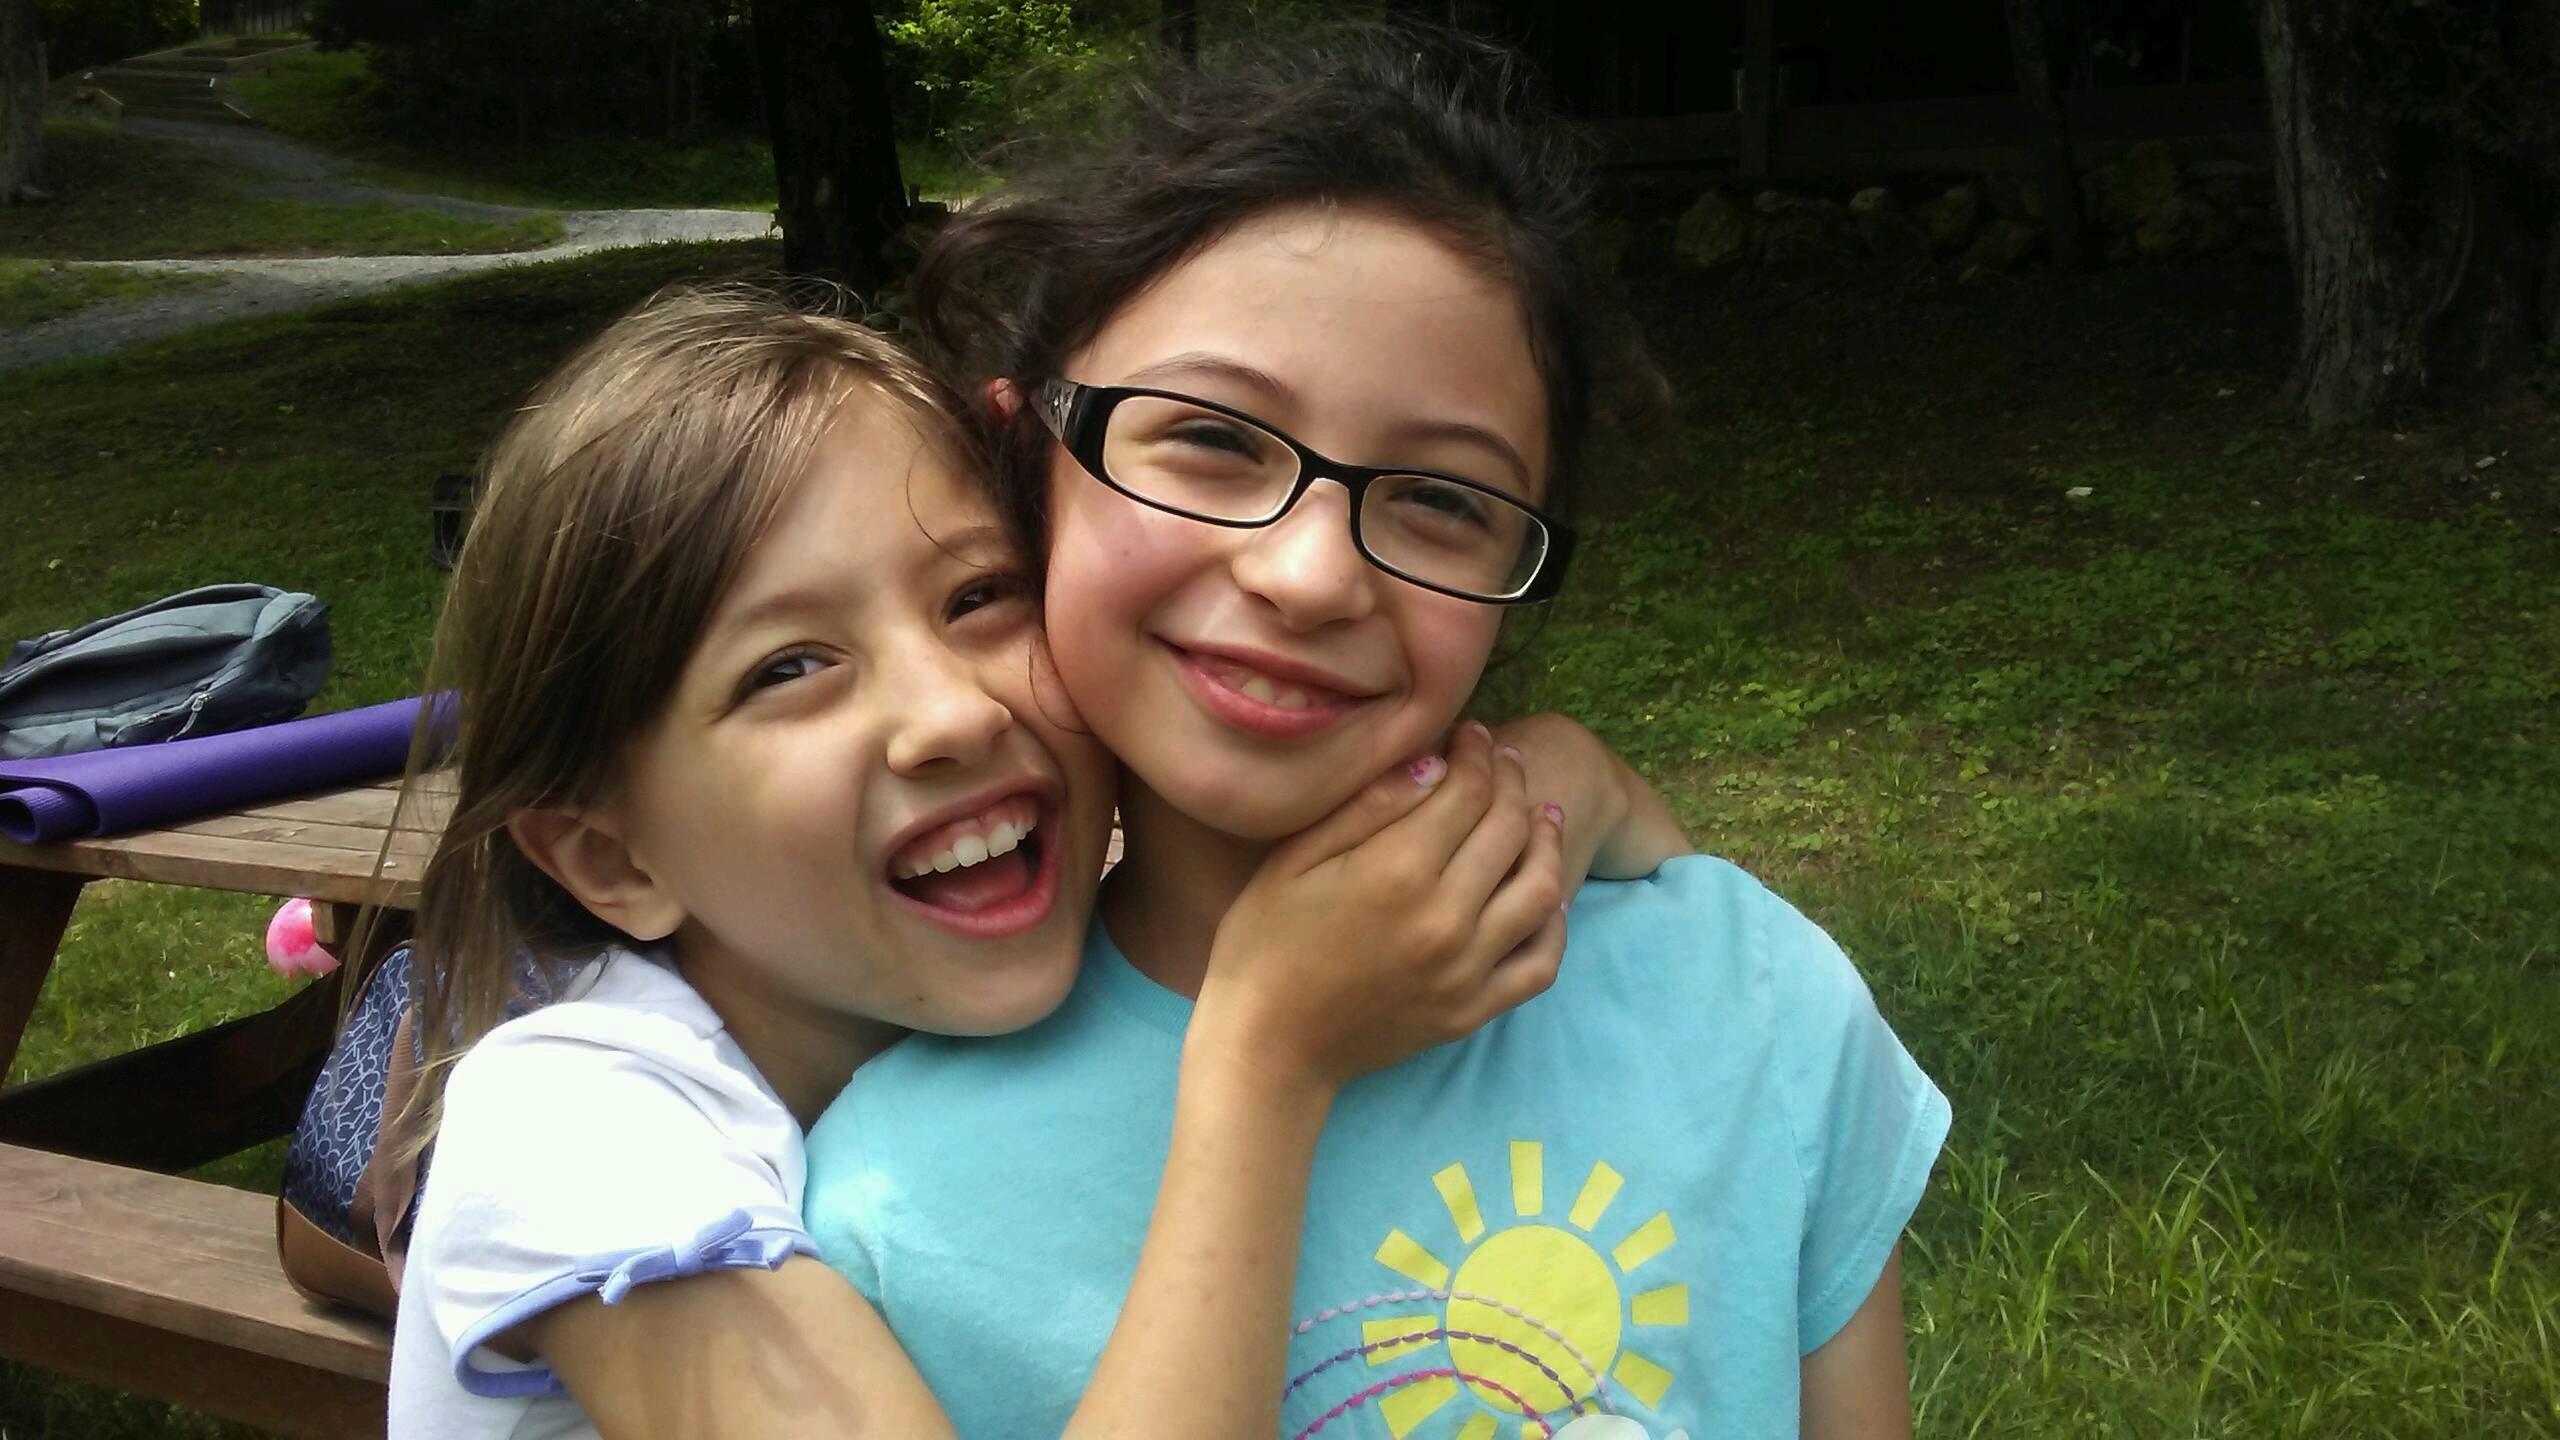 Shanti & Haleigh